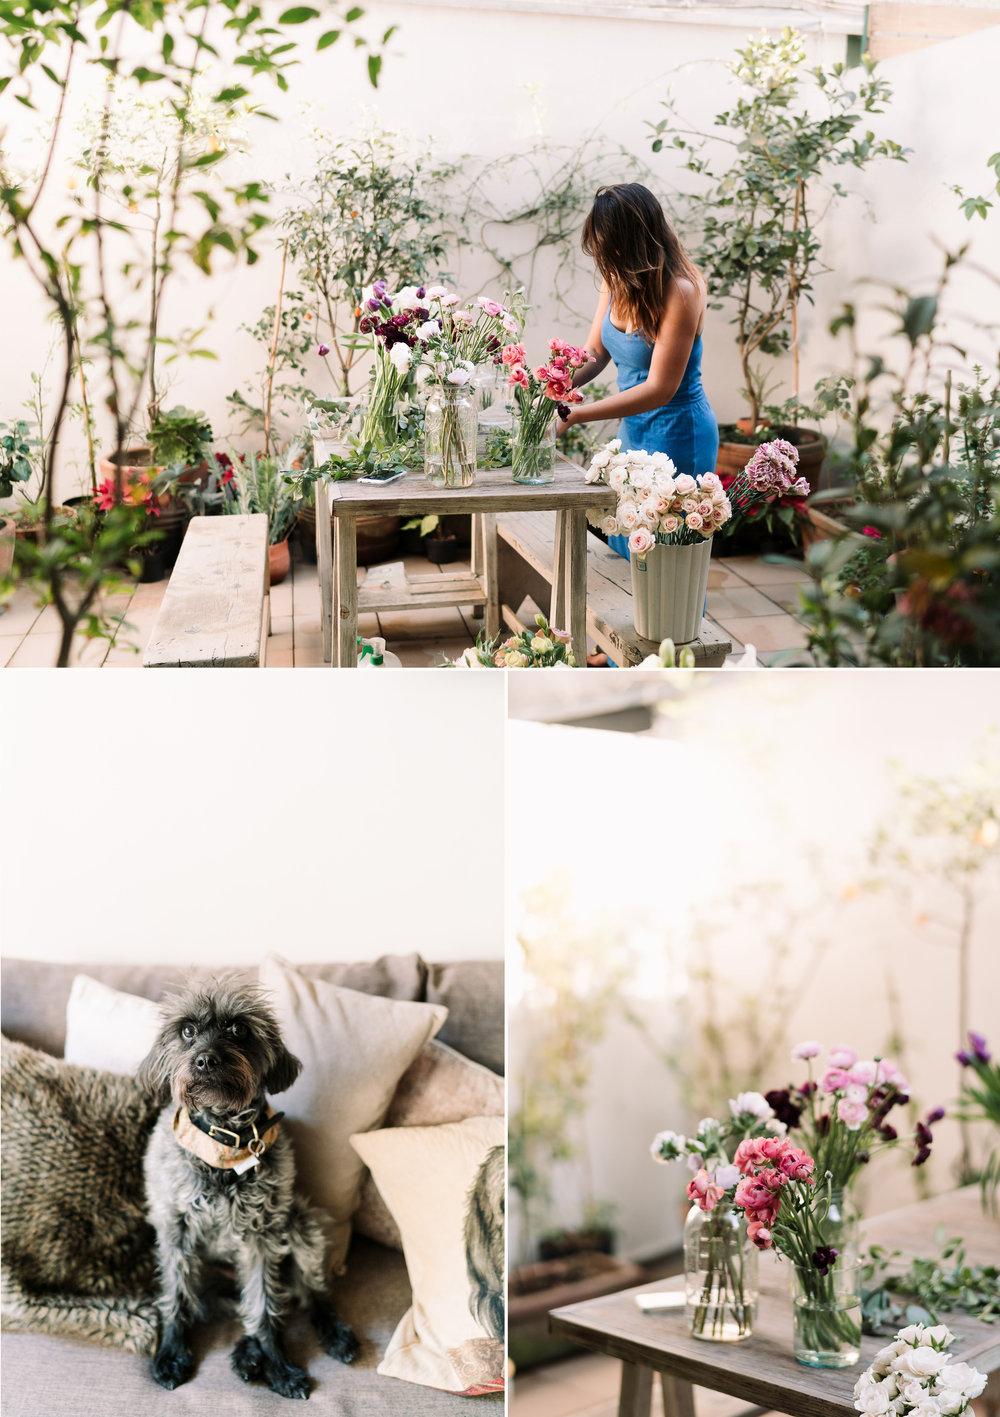 Floweriize: artista del mes